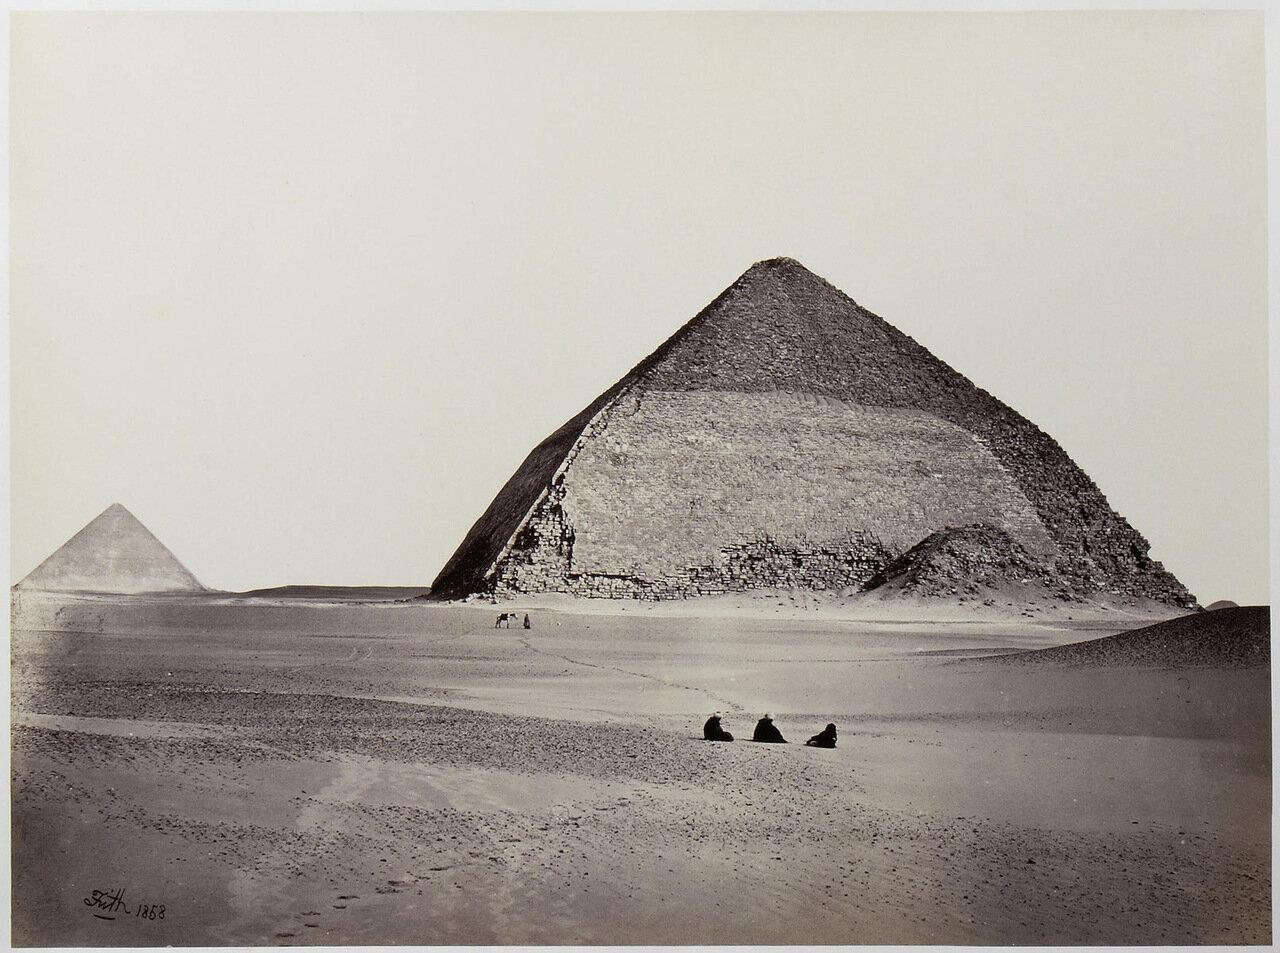 Ломаная пирамида Снофру в Дашуре. 1858